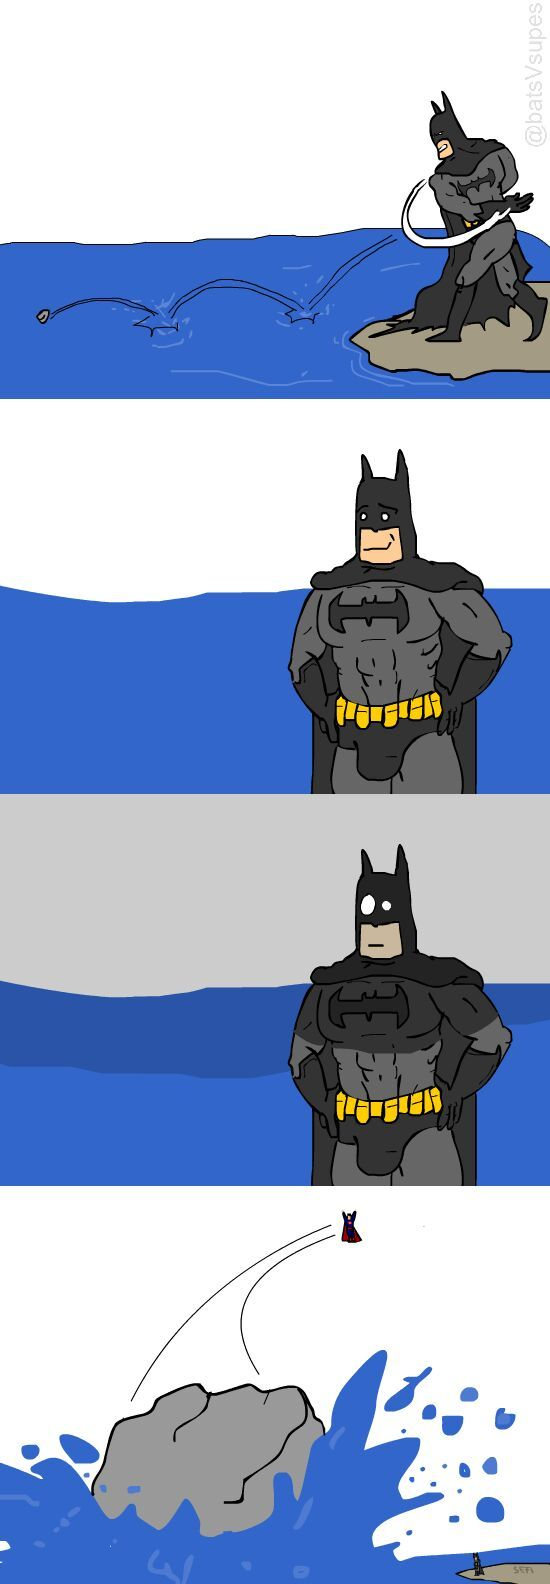 superman and stones - meme